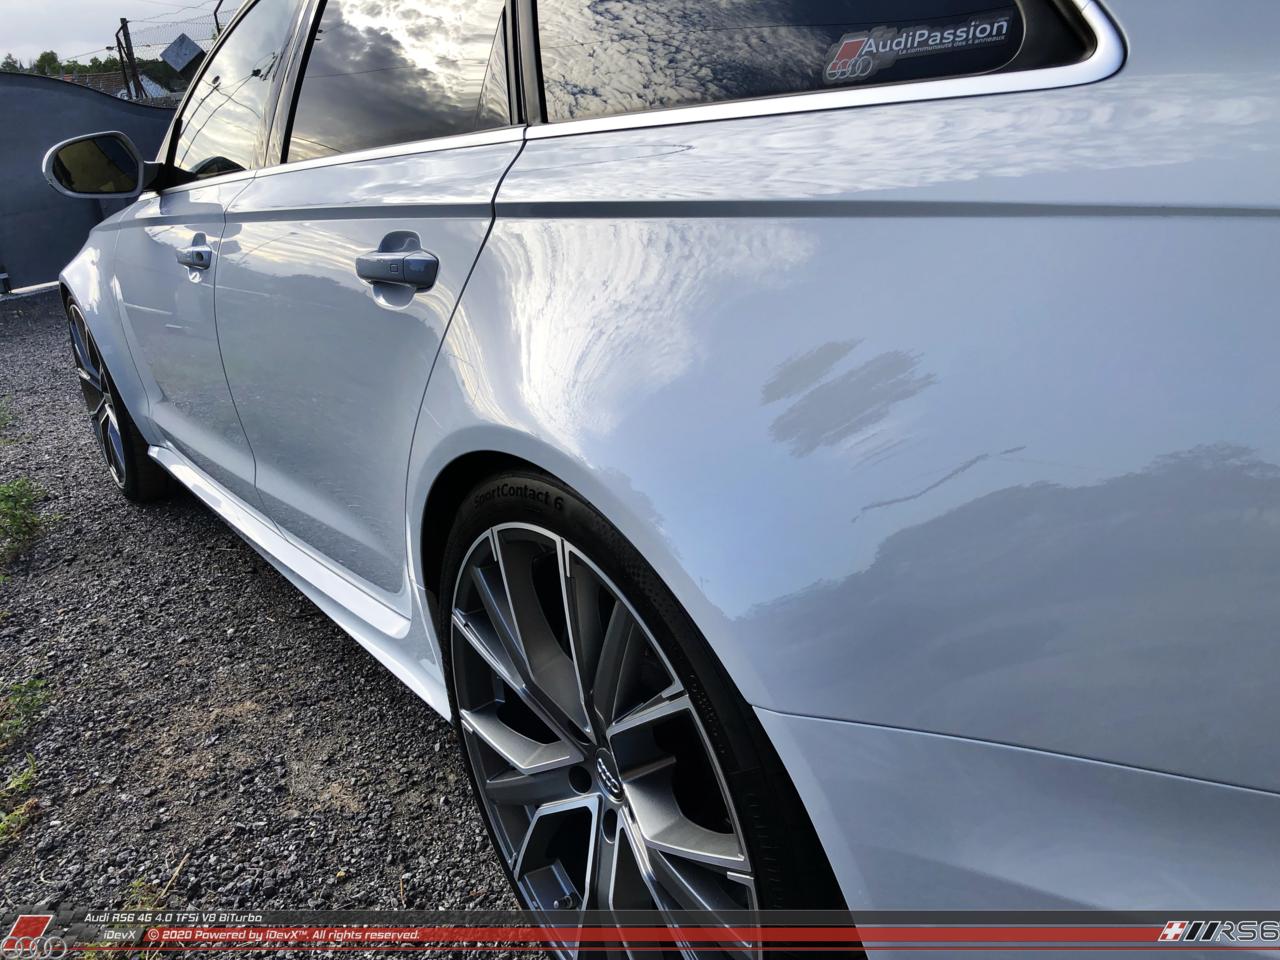 05_08.2019_Audi-RS6_iDevX_044.png